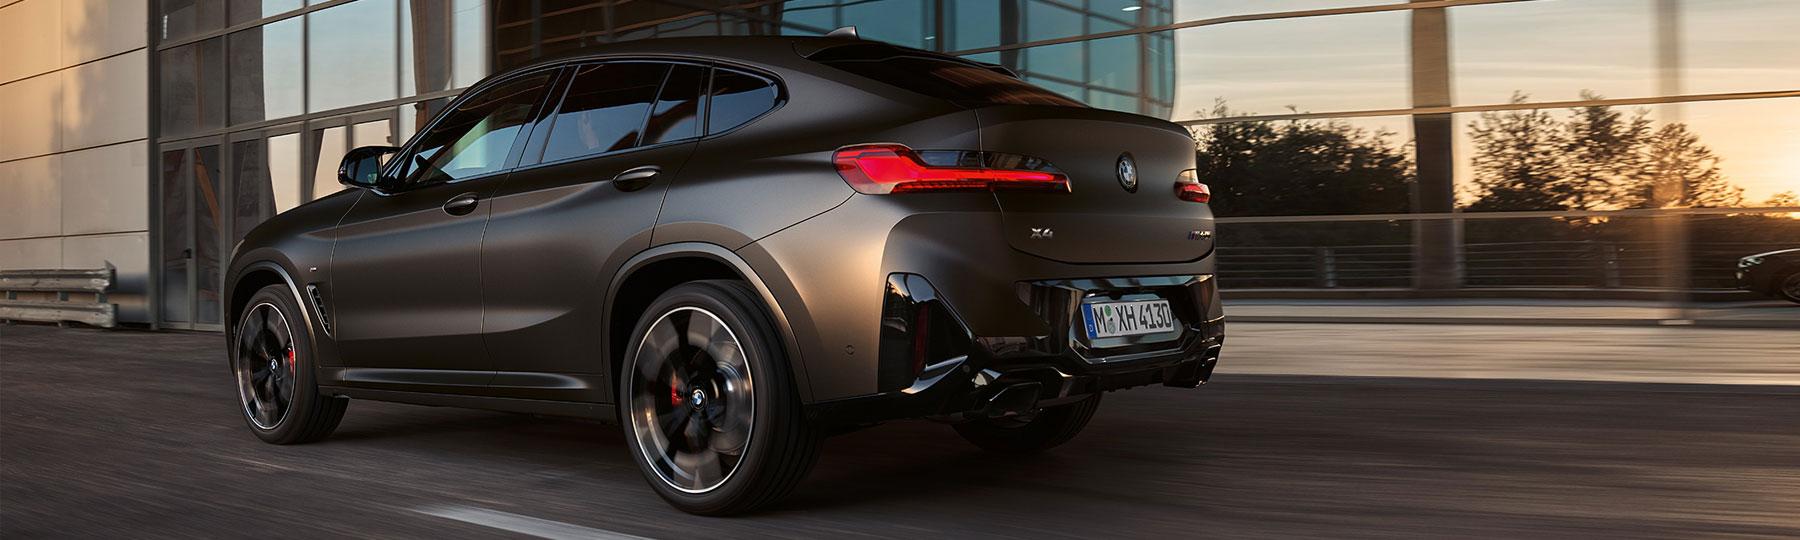 BMW X4 New Car Offer